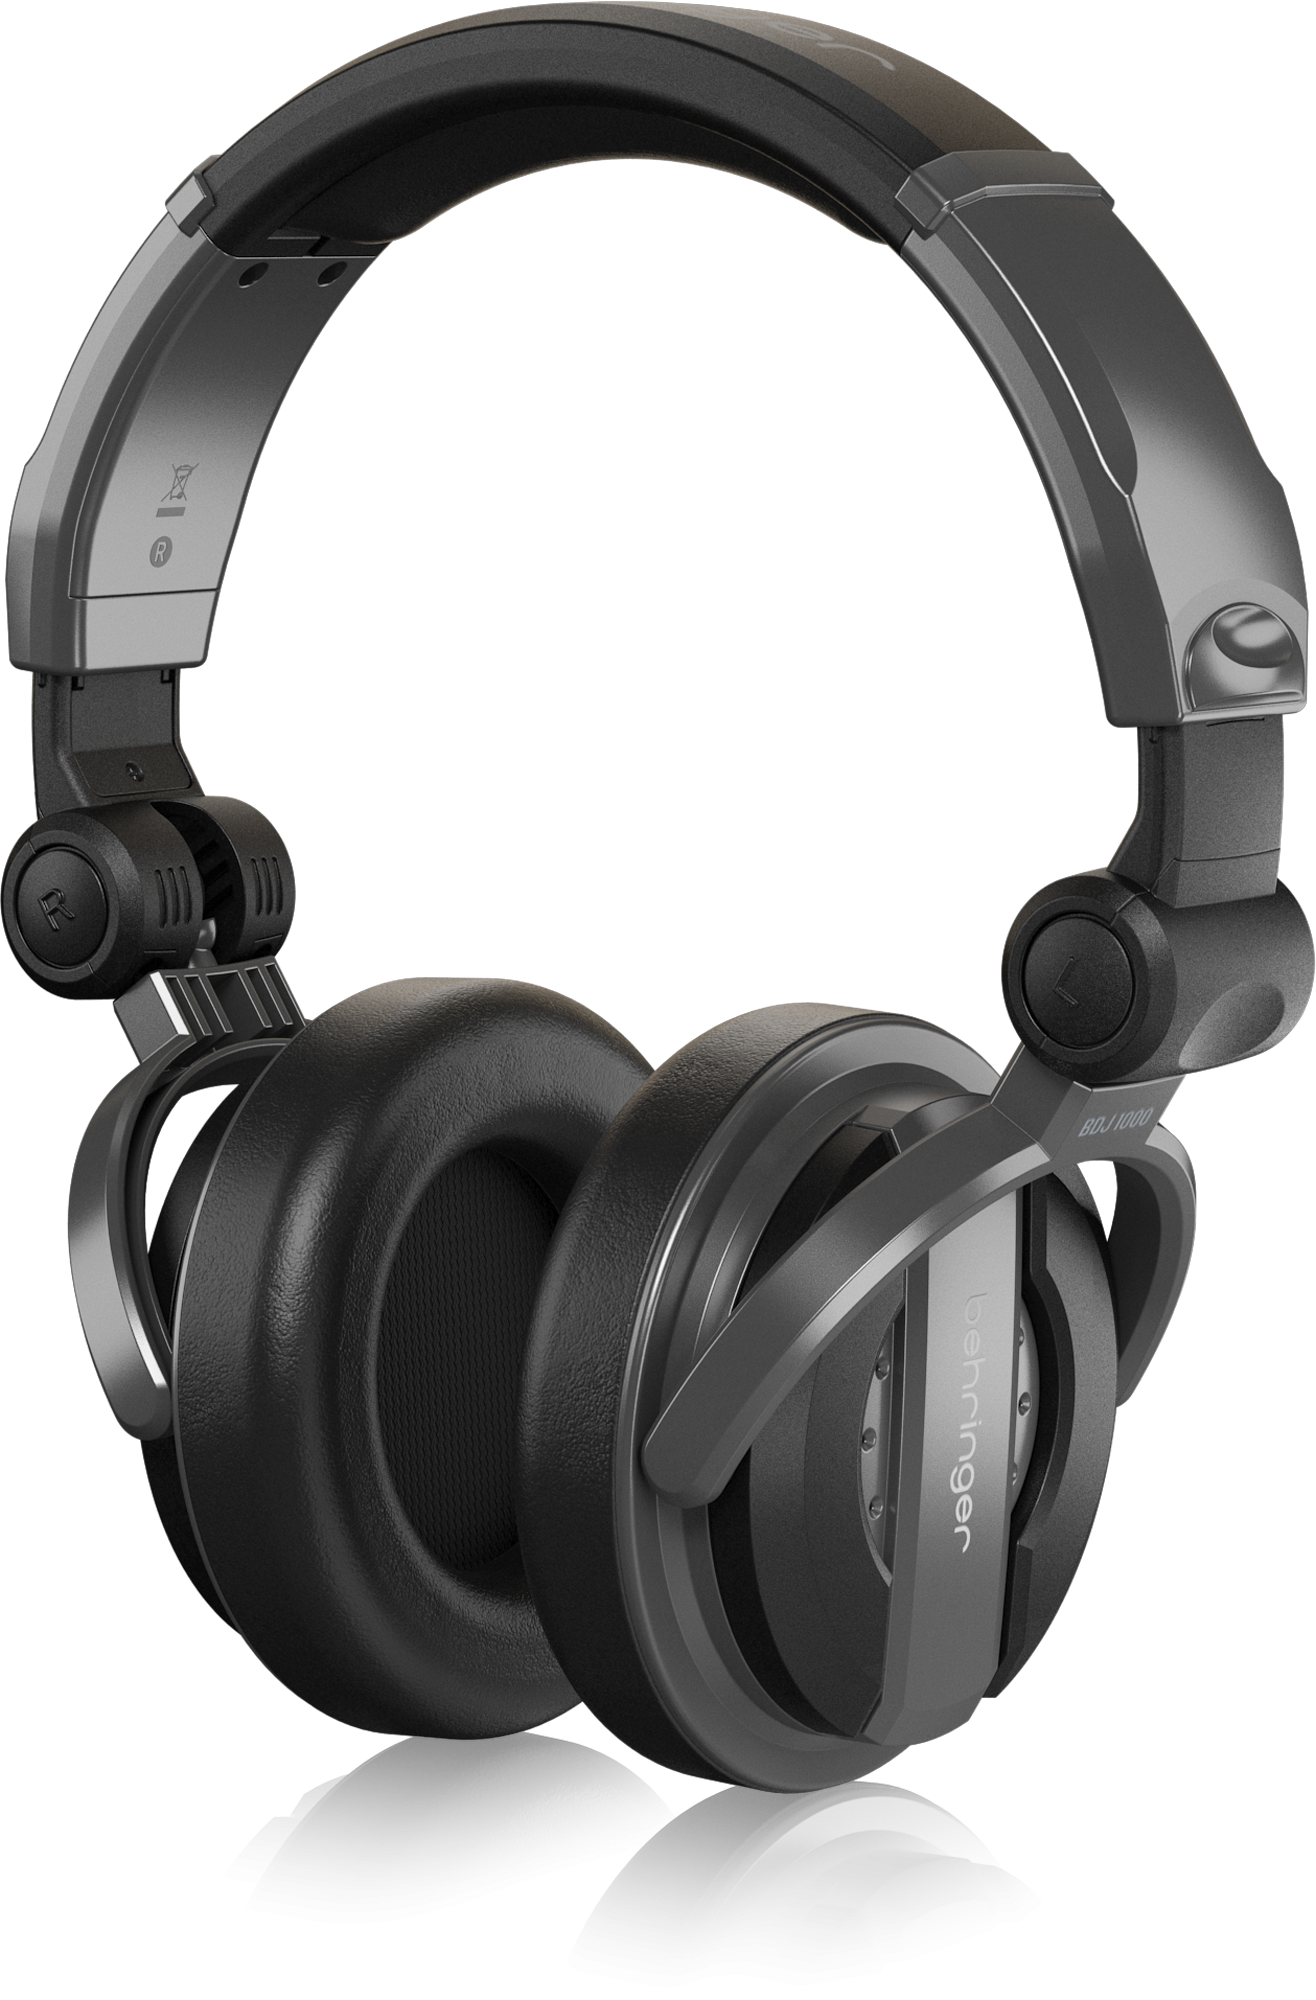 BEHRINGER BDJ 1000 słuchawki monitorujące dla DJ-a